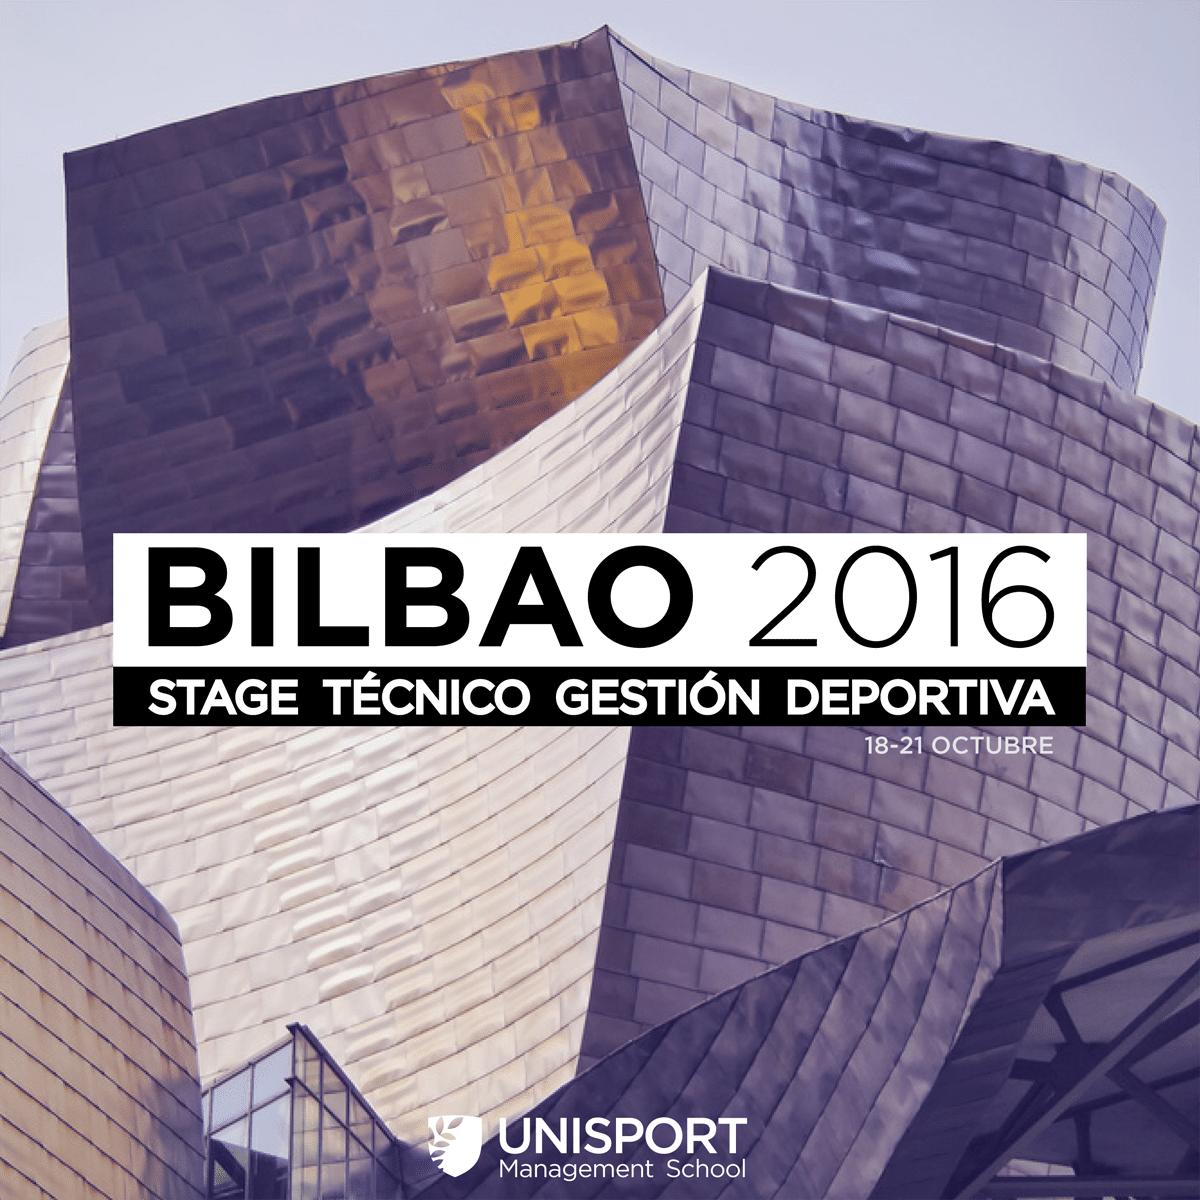 Imagen Promocional Stage Técnico Bilbao 2016